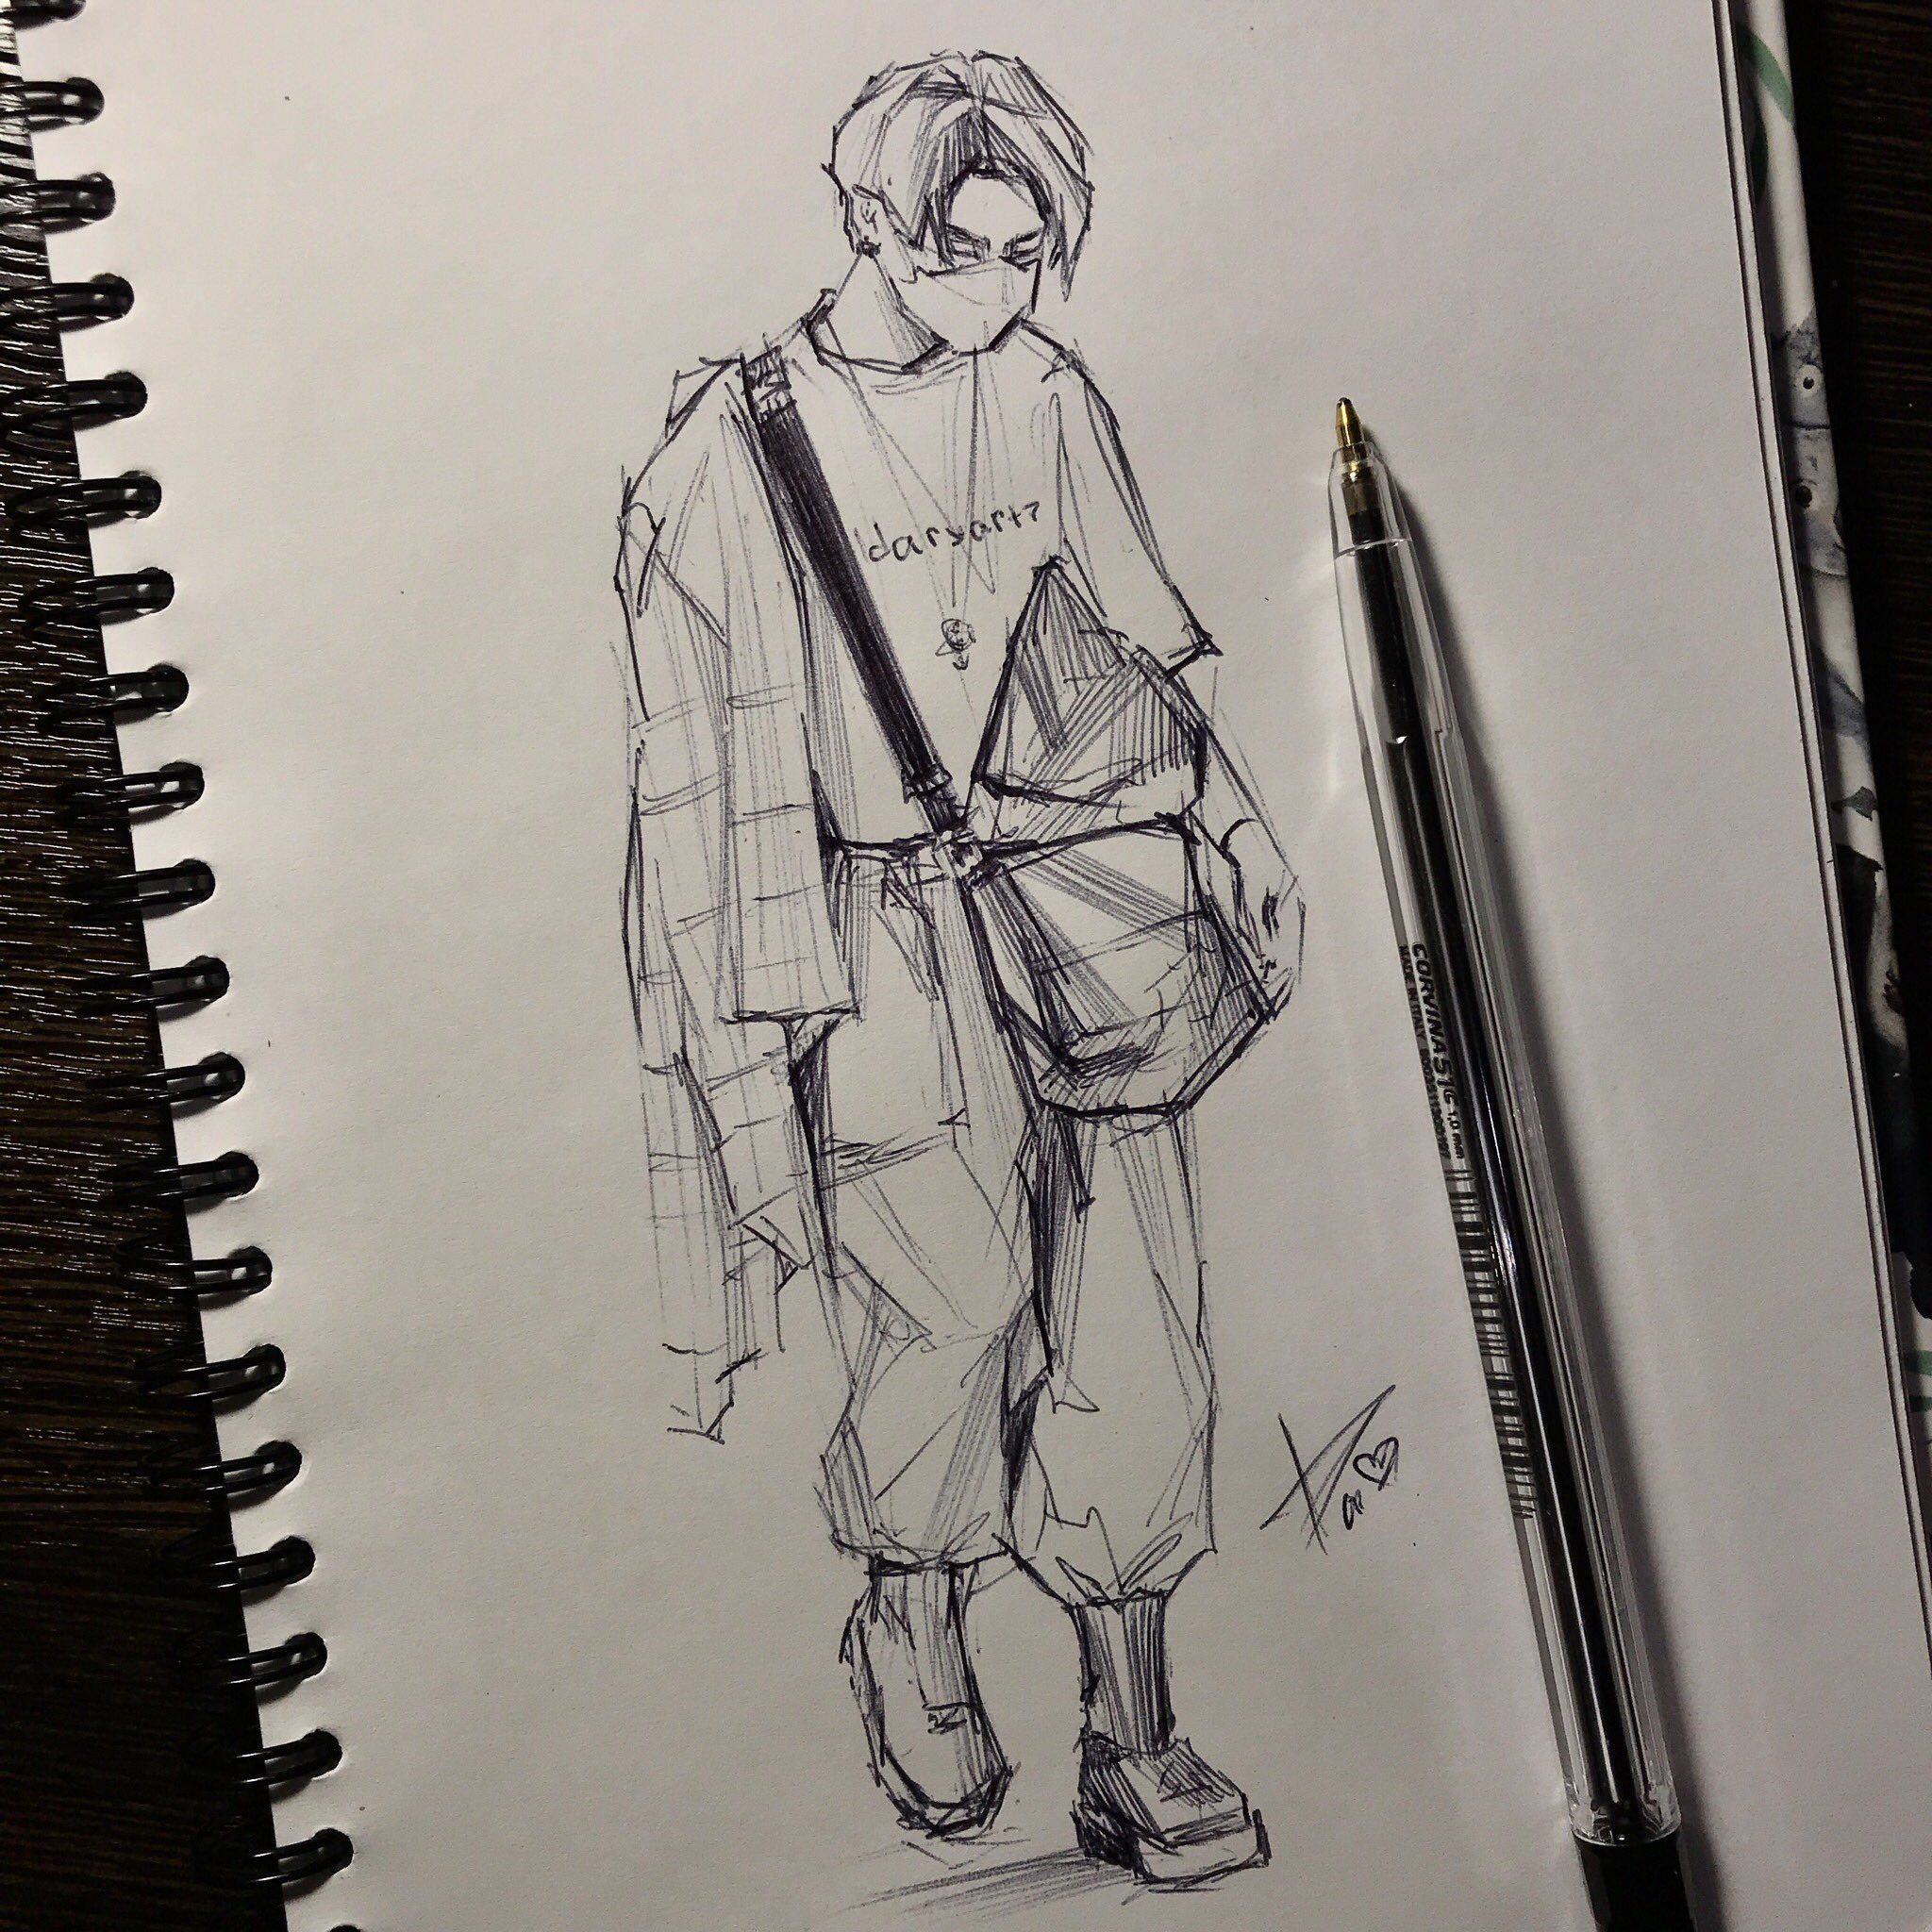 Jk Bts Bts Drawings Kpop Drawings Bts Fanart